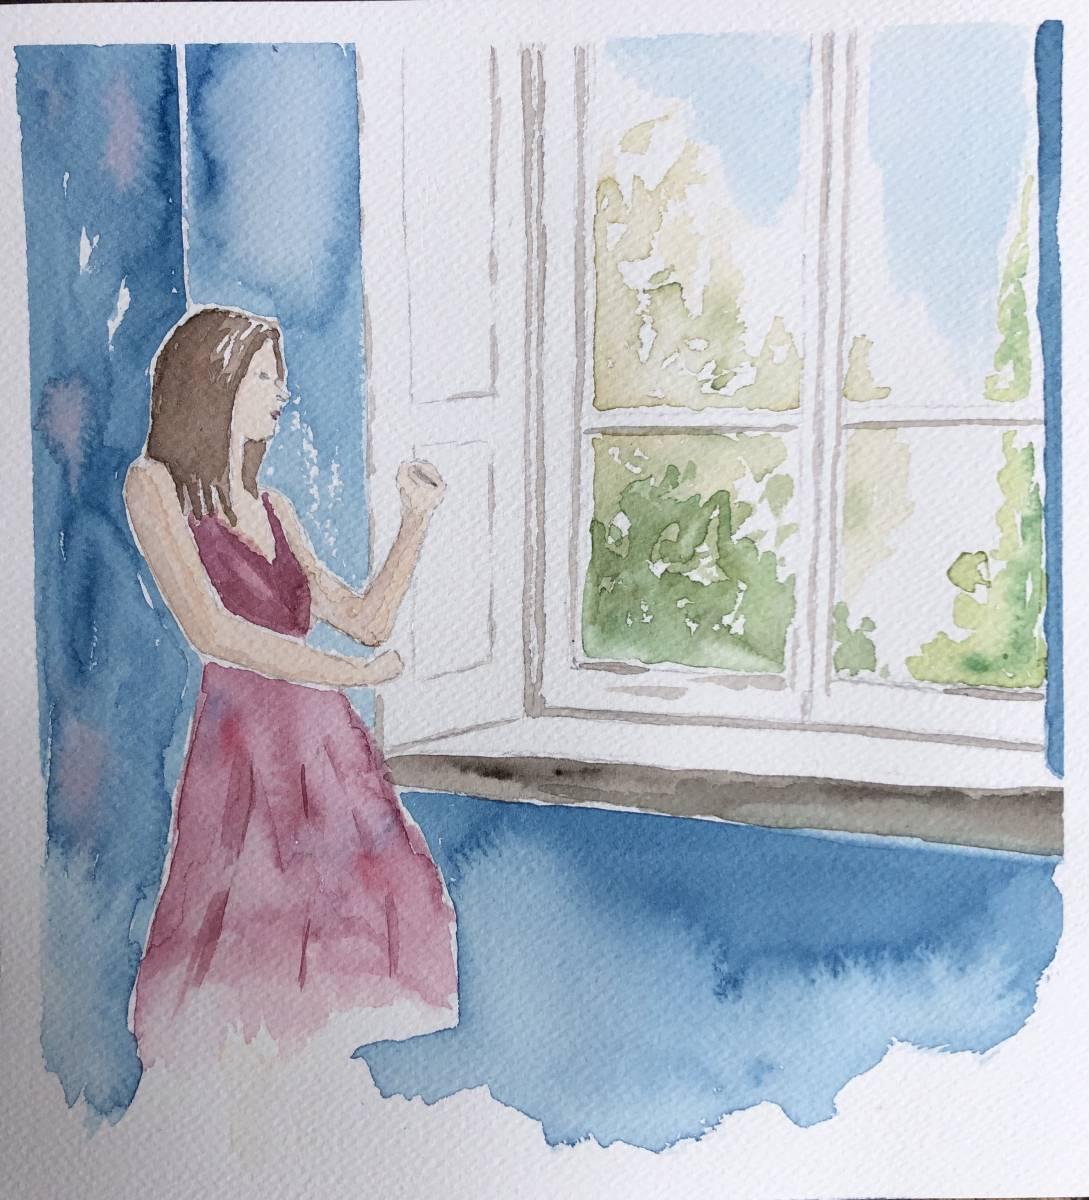 'Frau am Fenster' von  Anja Napiany